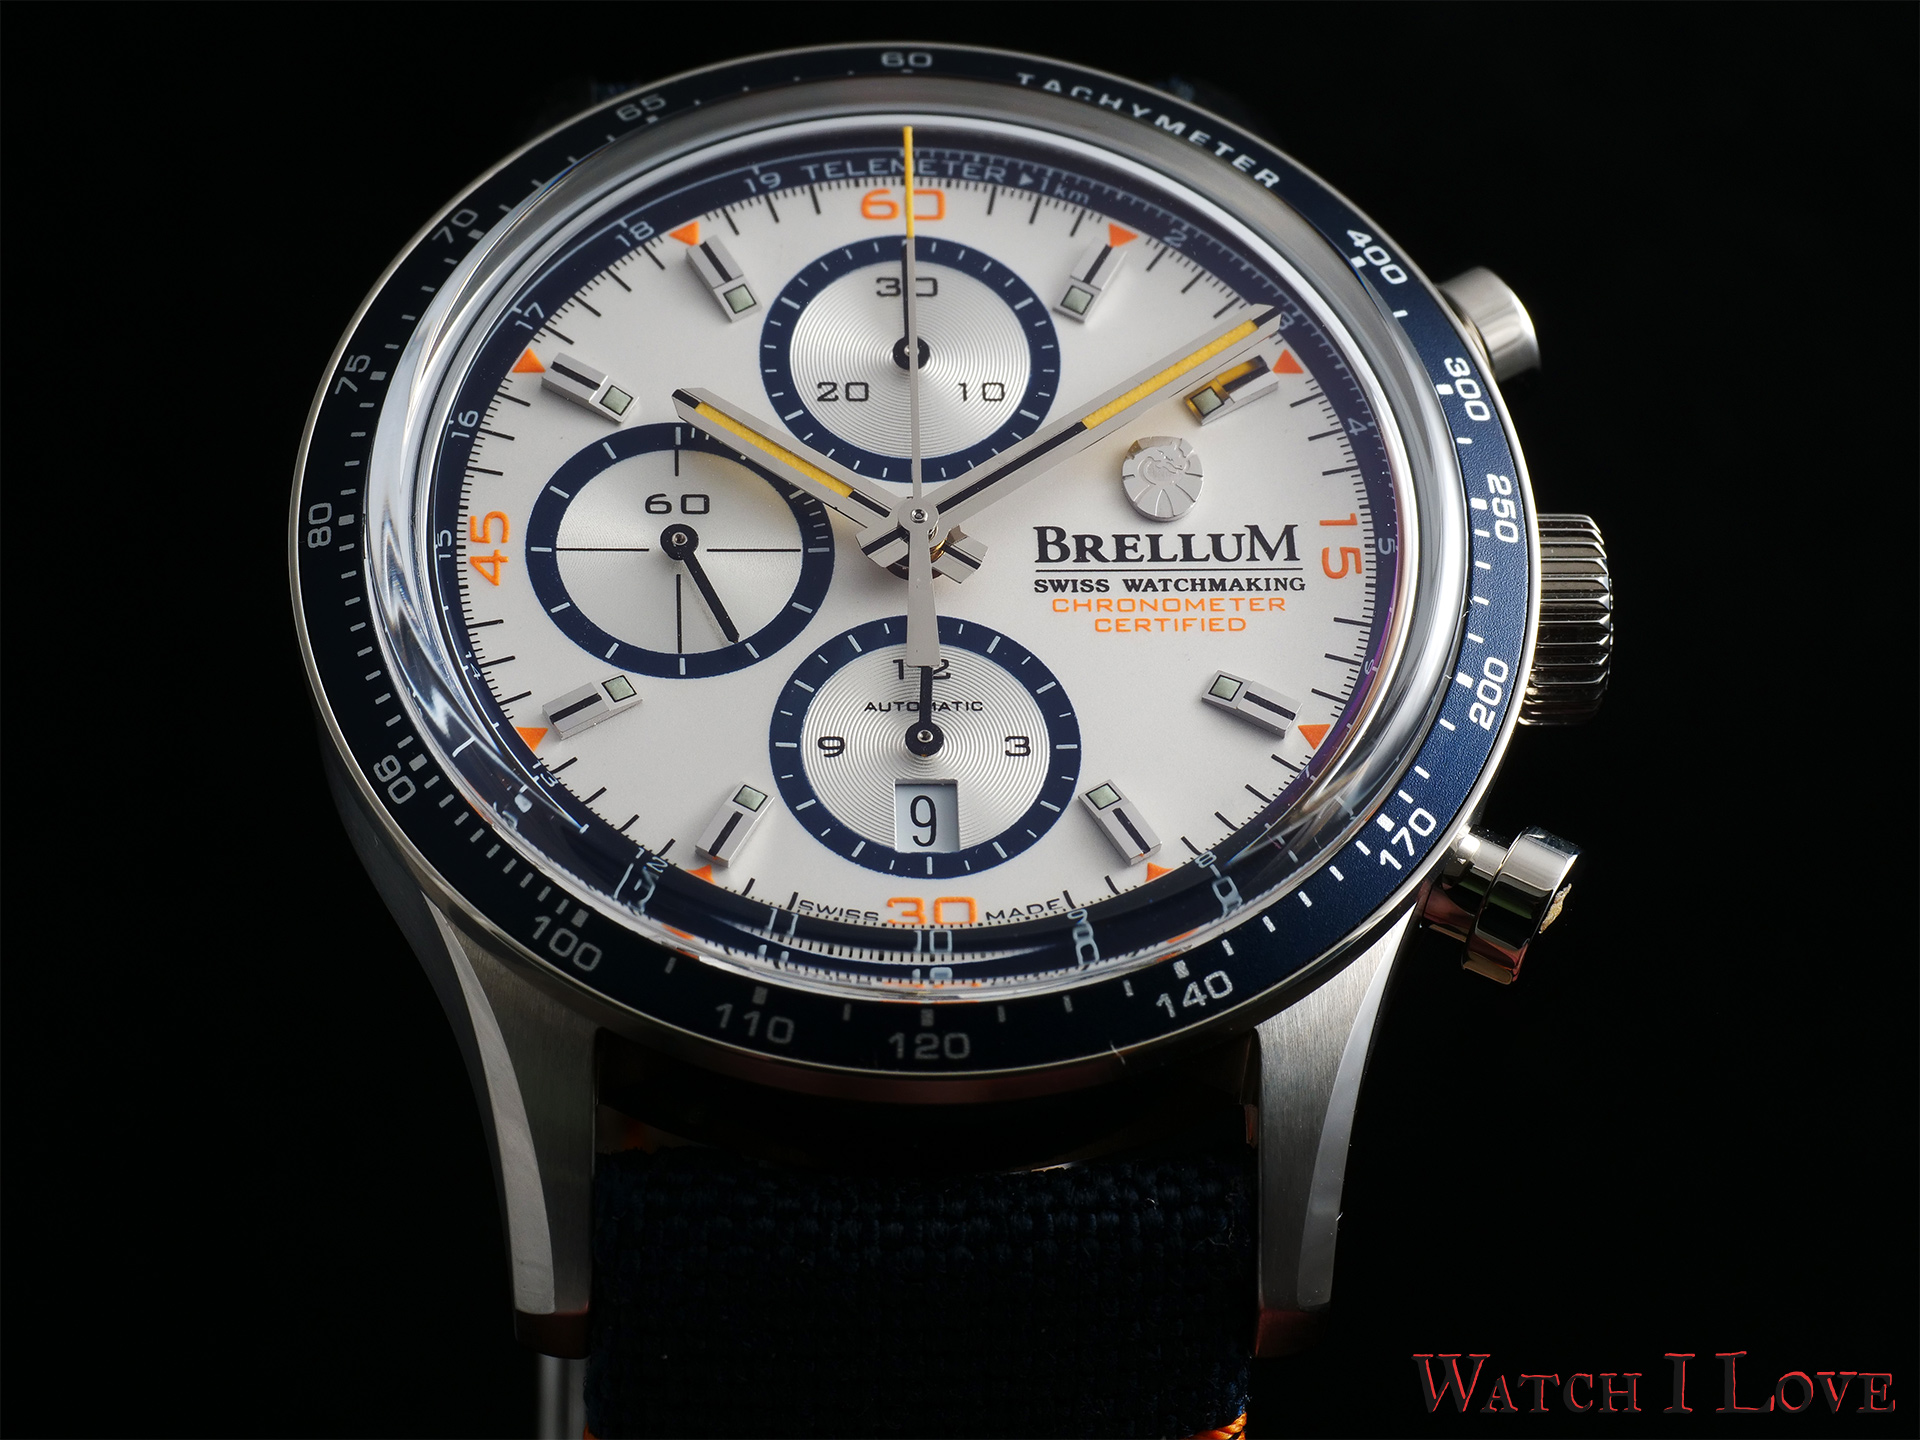 The lastest Marina 2 Chronograph